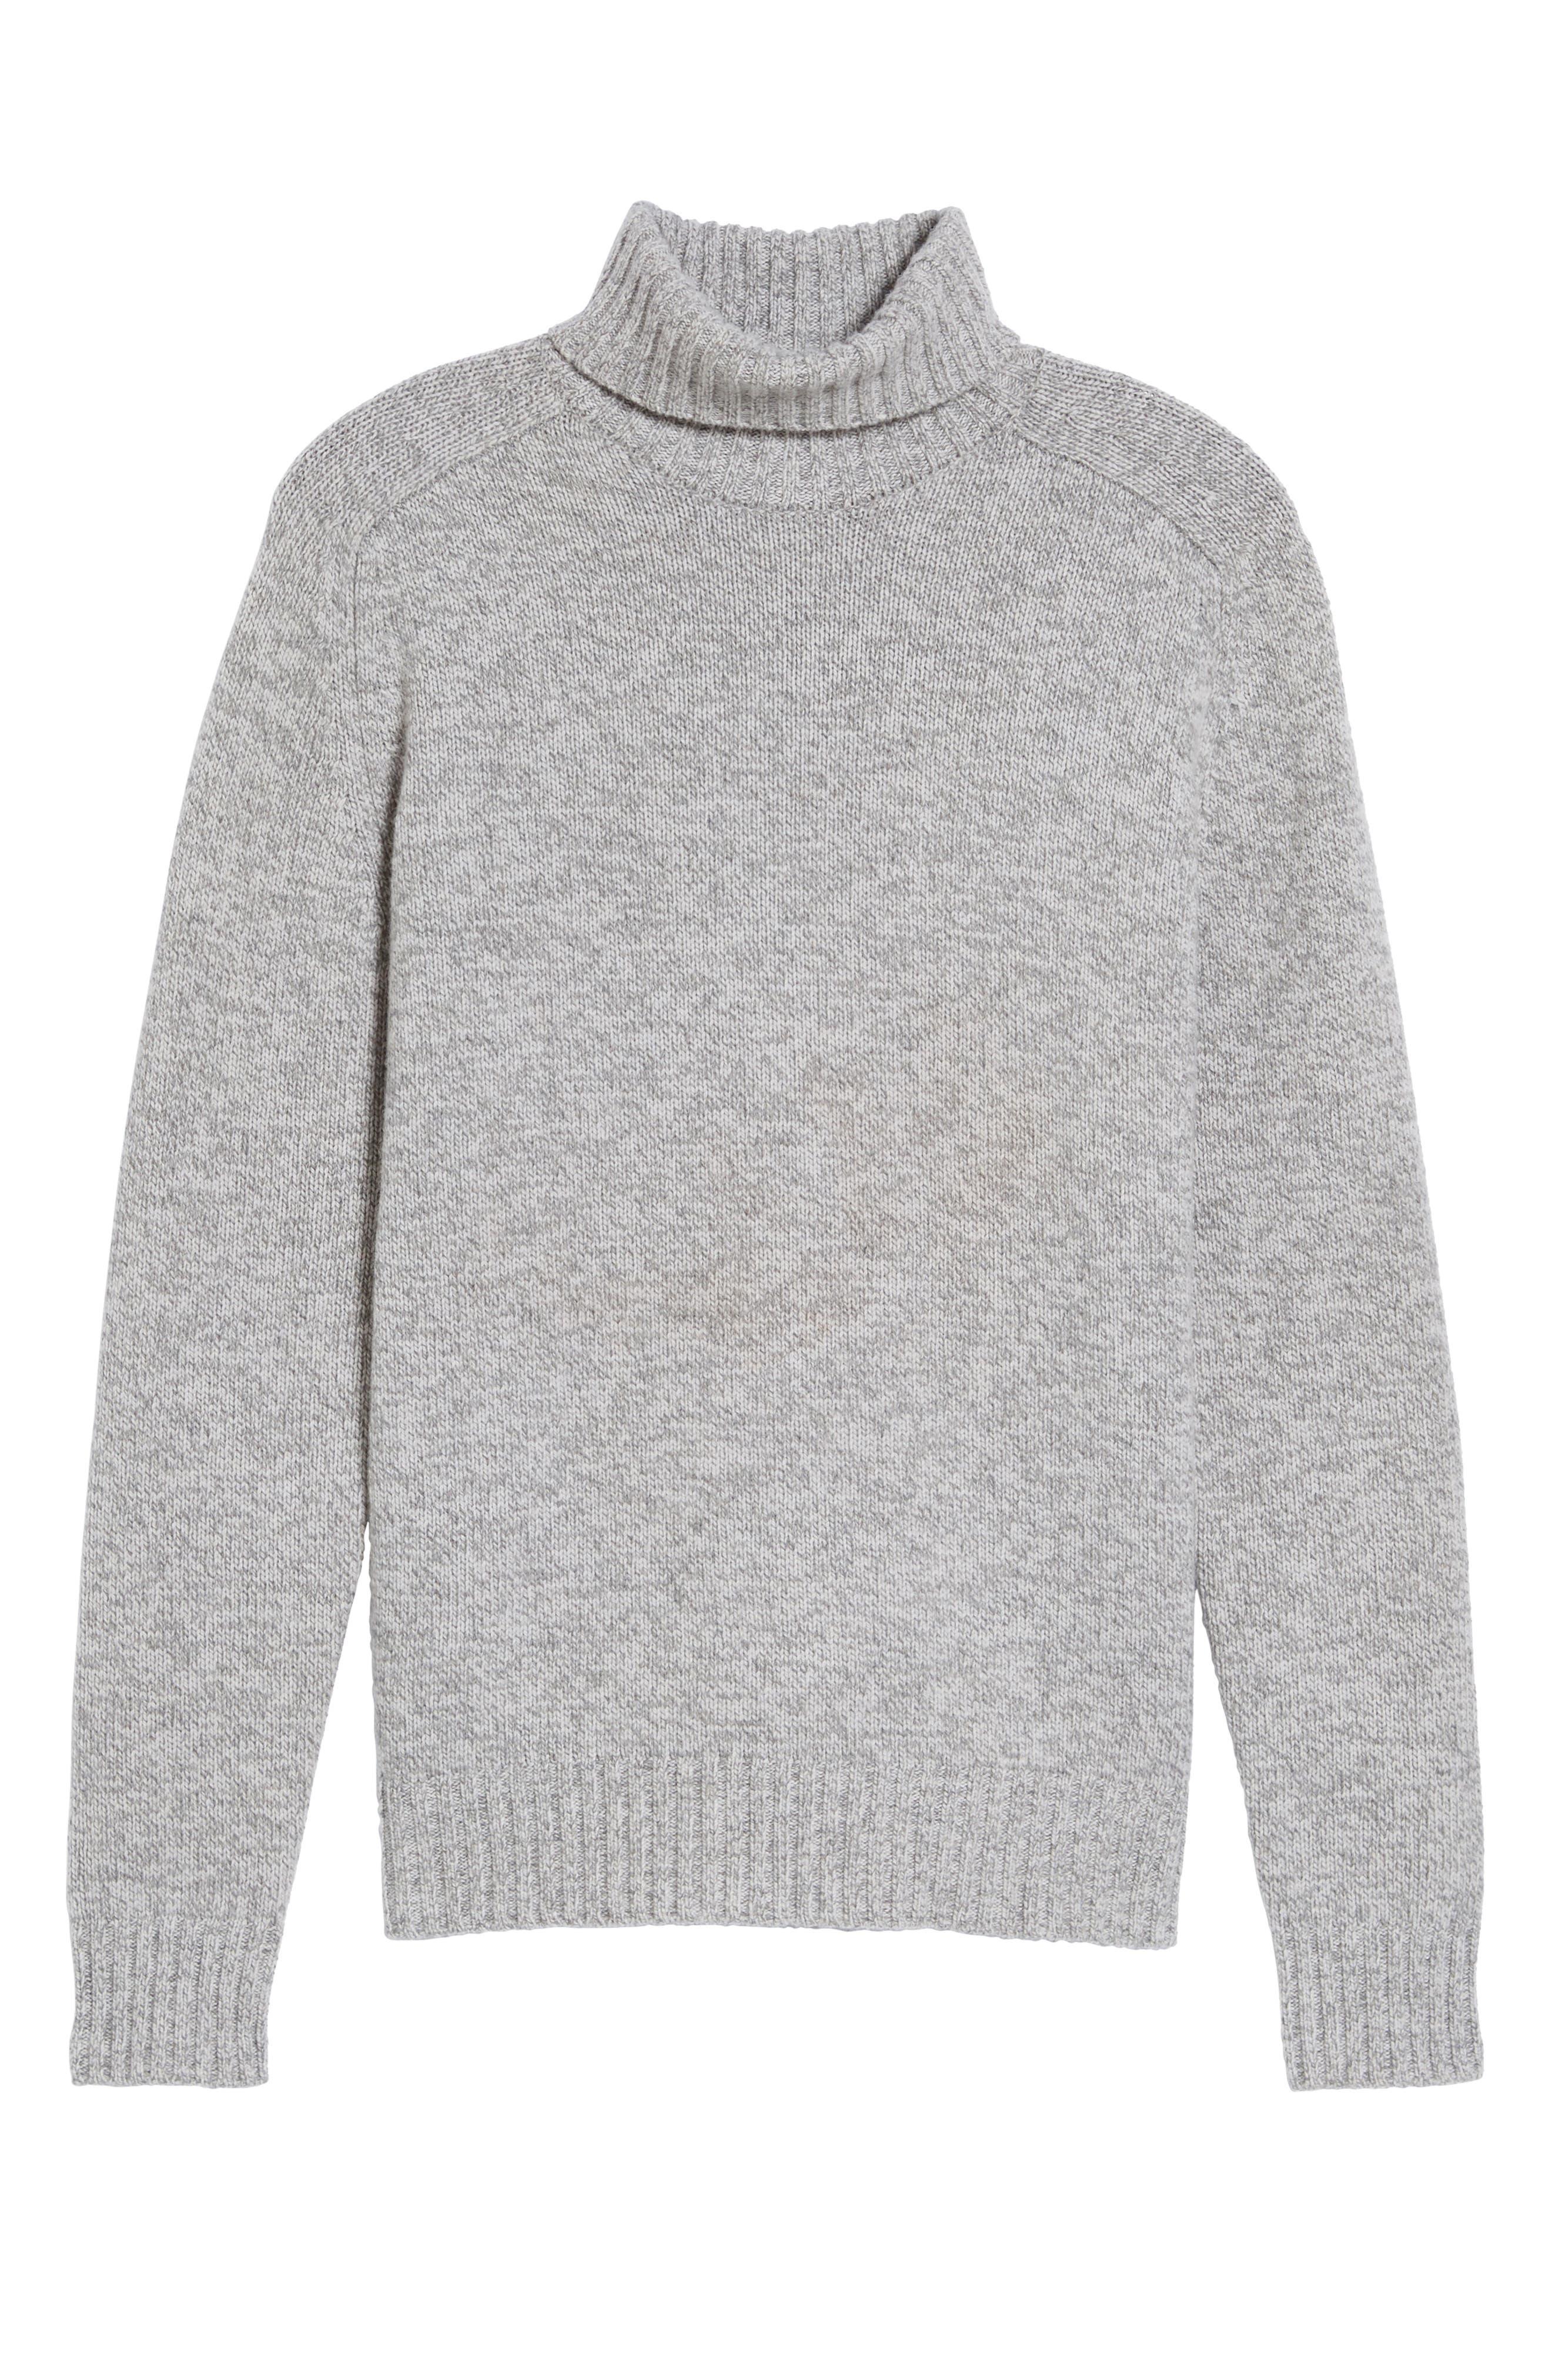 Marled Turtleneck Sweater,                             Alternate thumbnail 6, color,                             054